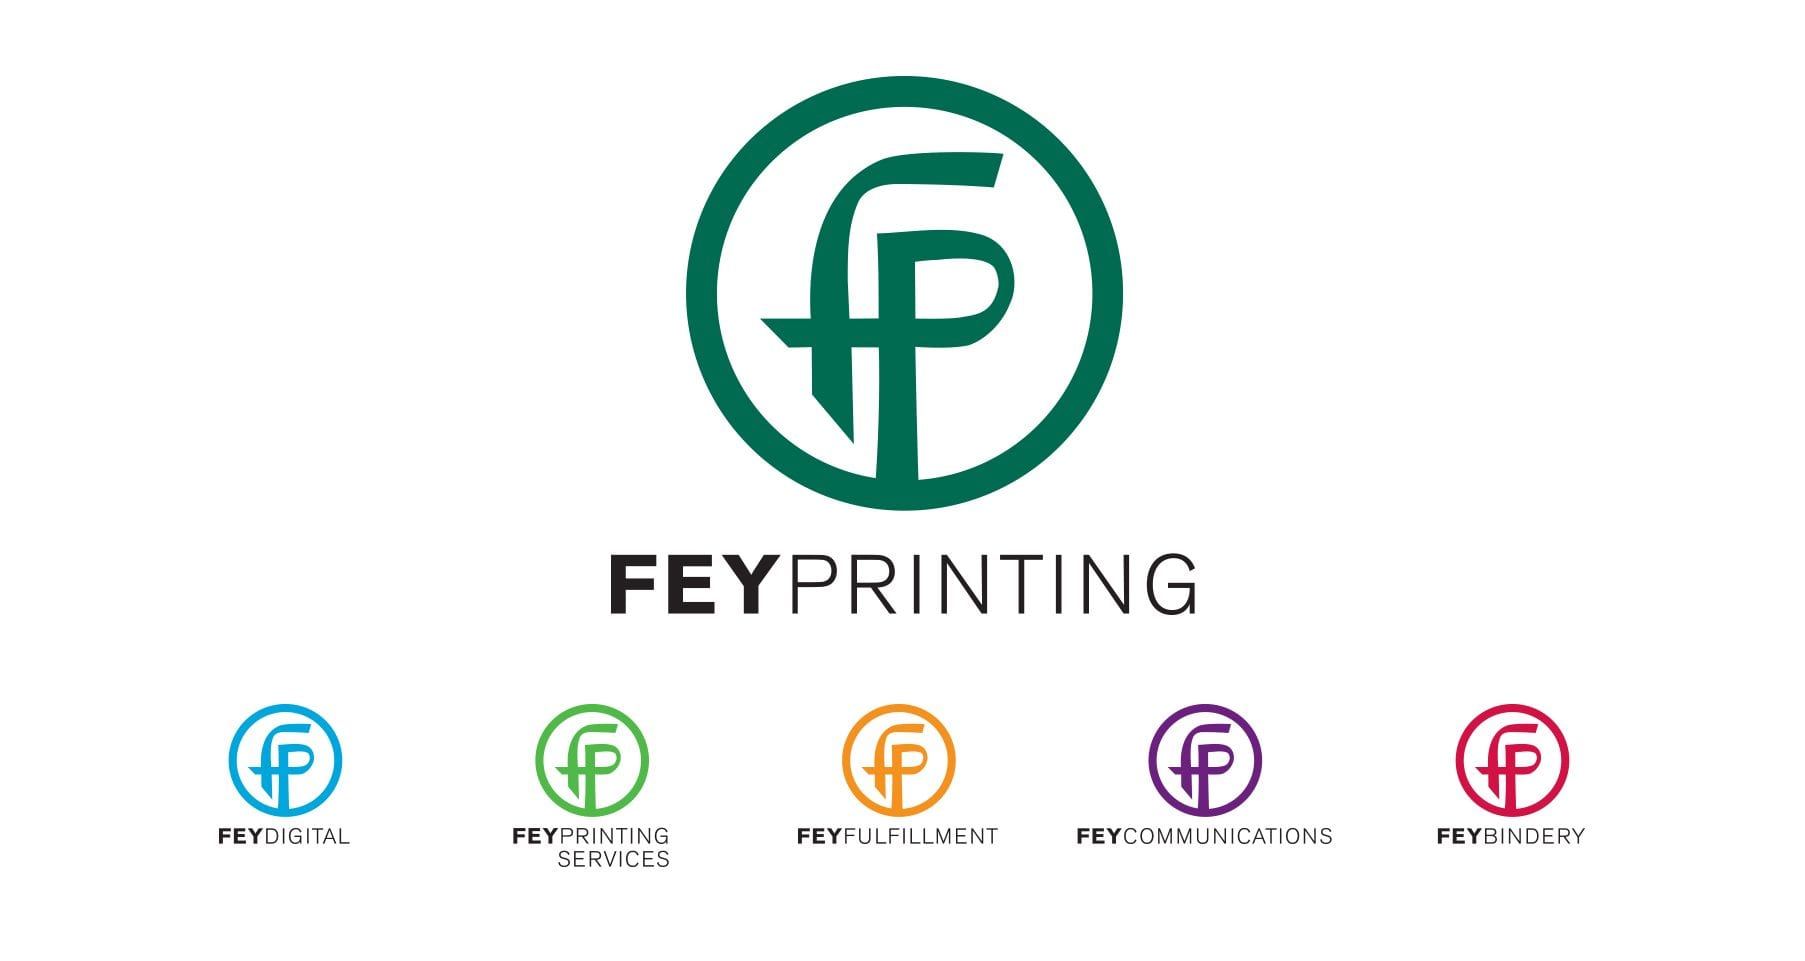 Fey Printing